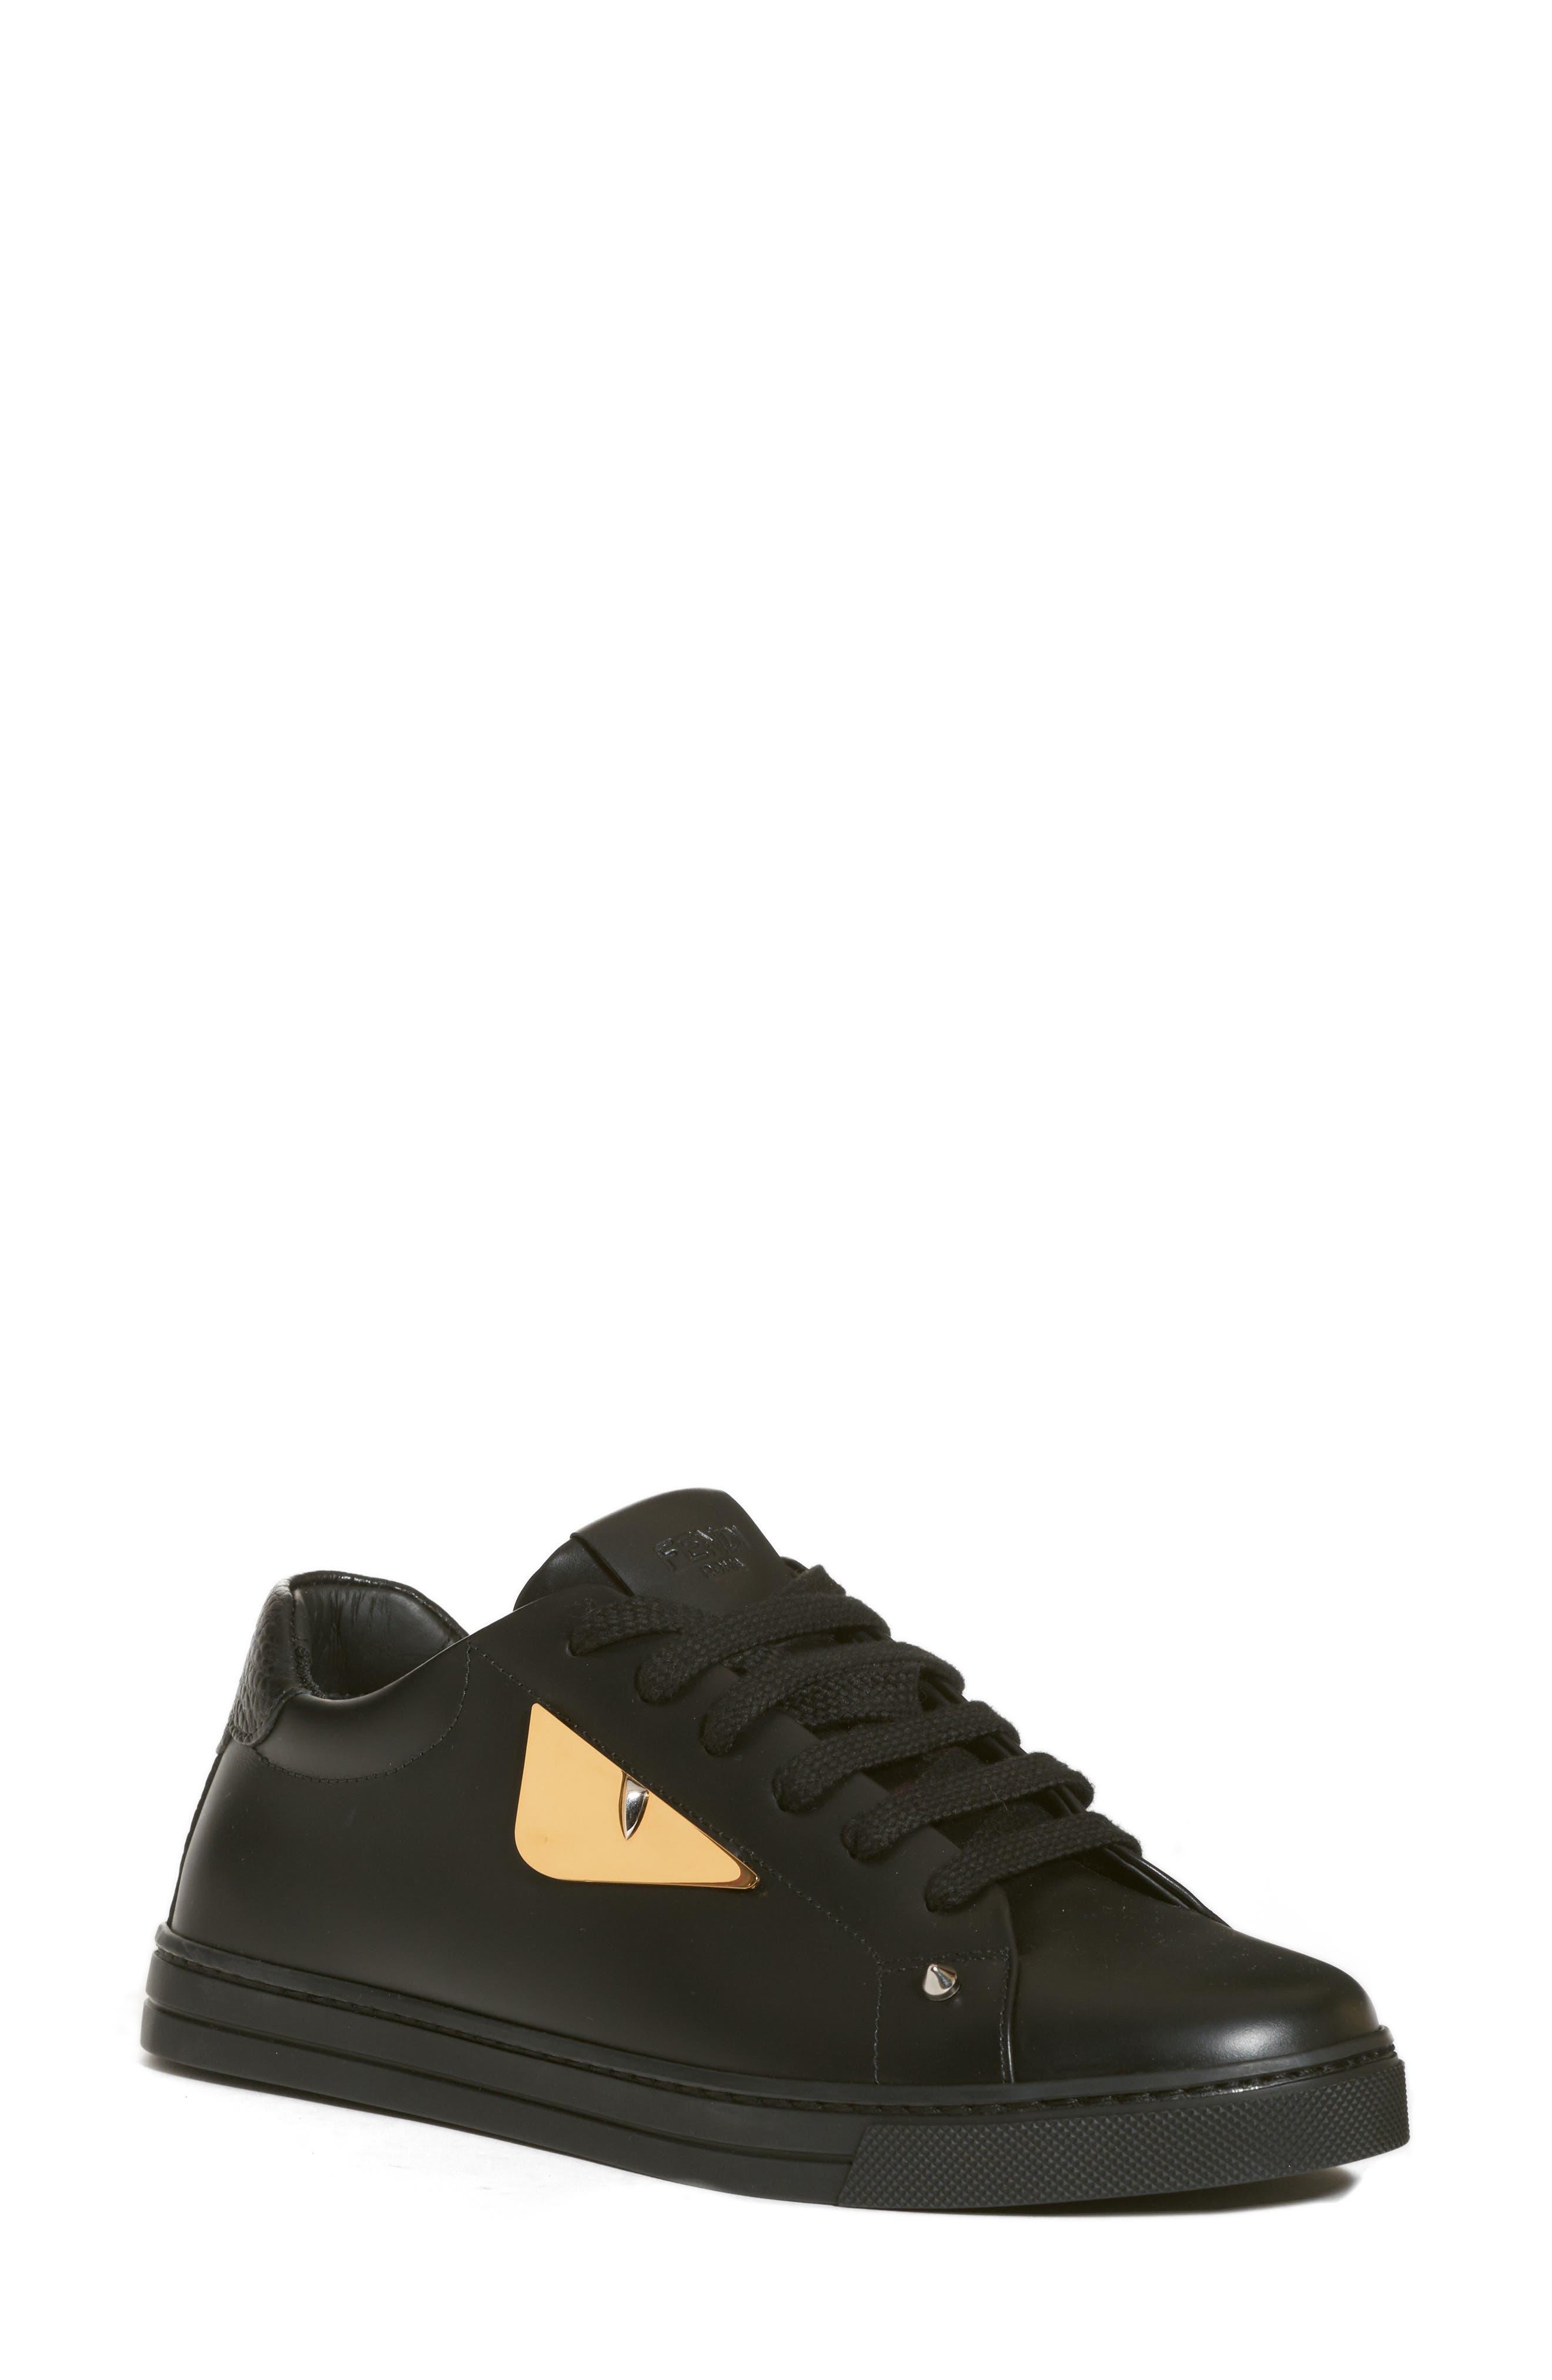 Bugs Sneaker,                         Main,                         color, BLACK